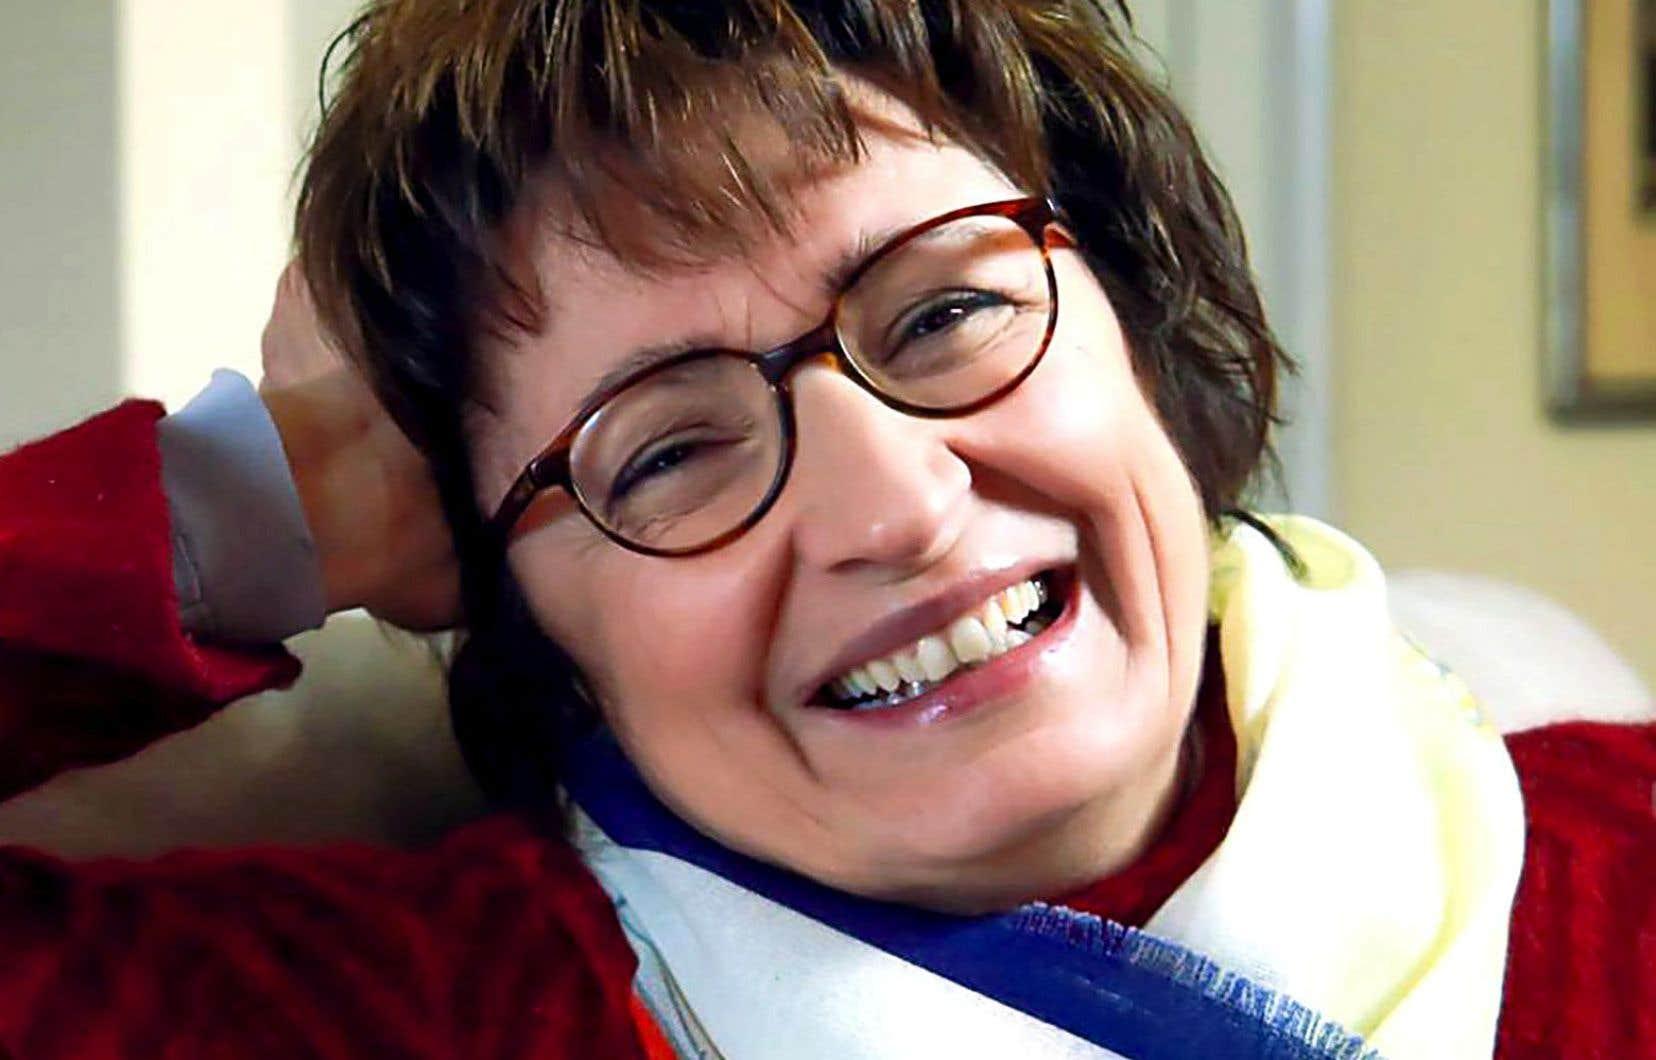 Donatella Di Pietrantonio habite l'Italie, où elle est dentiste pour enfants.